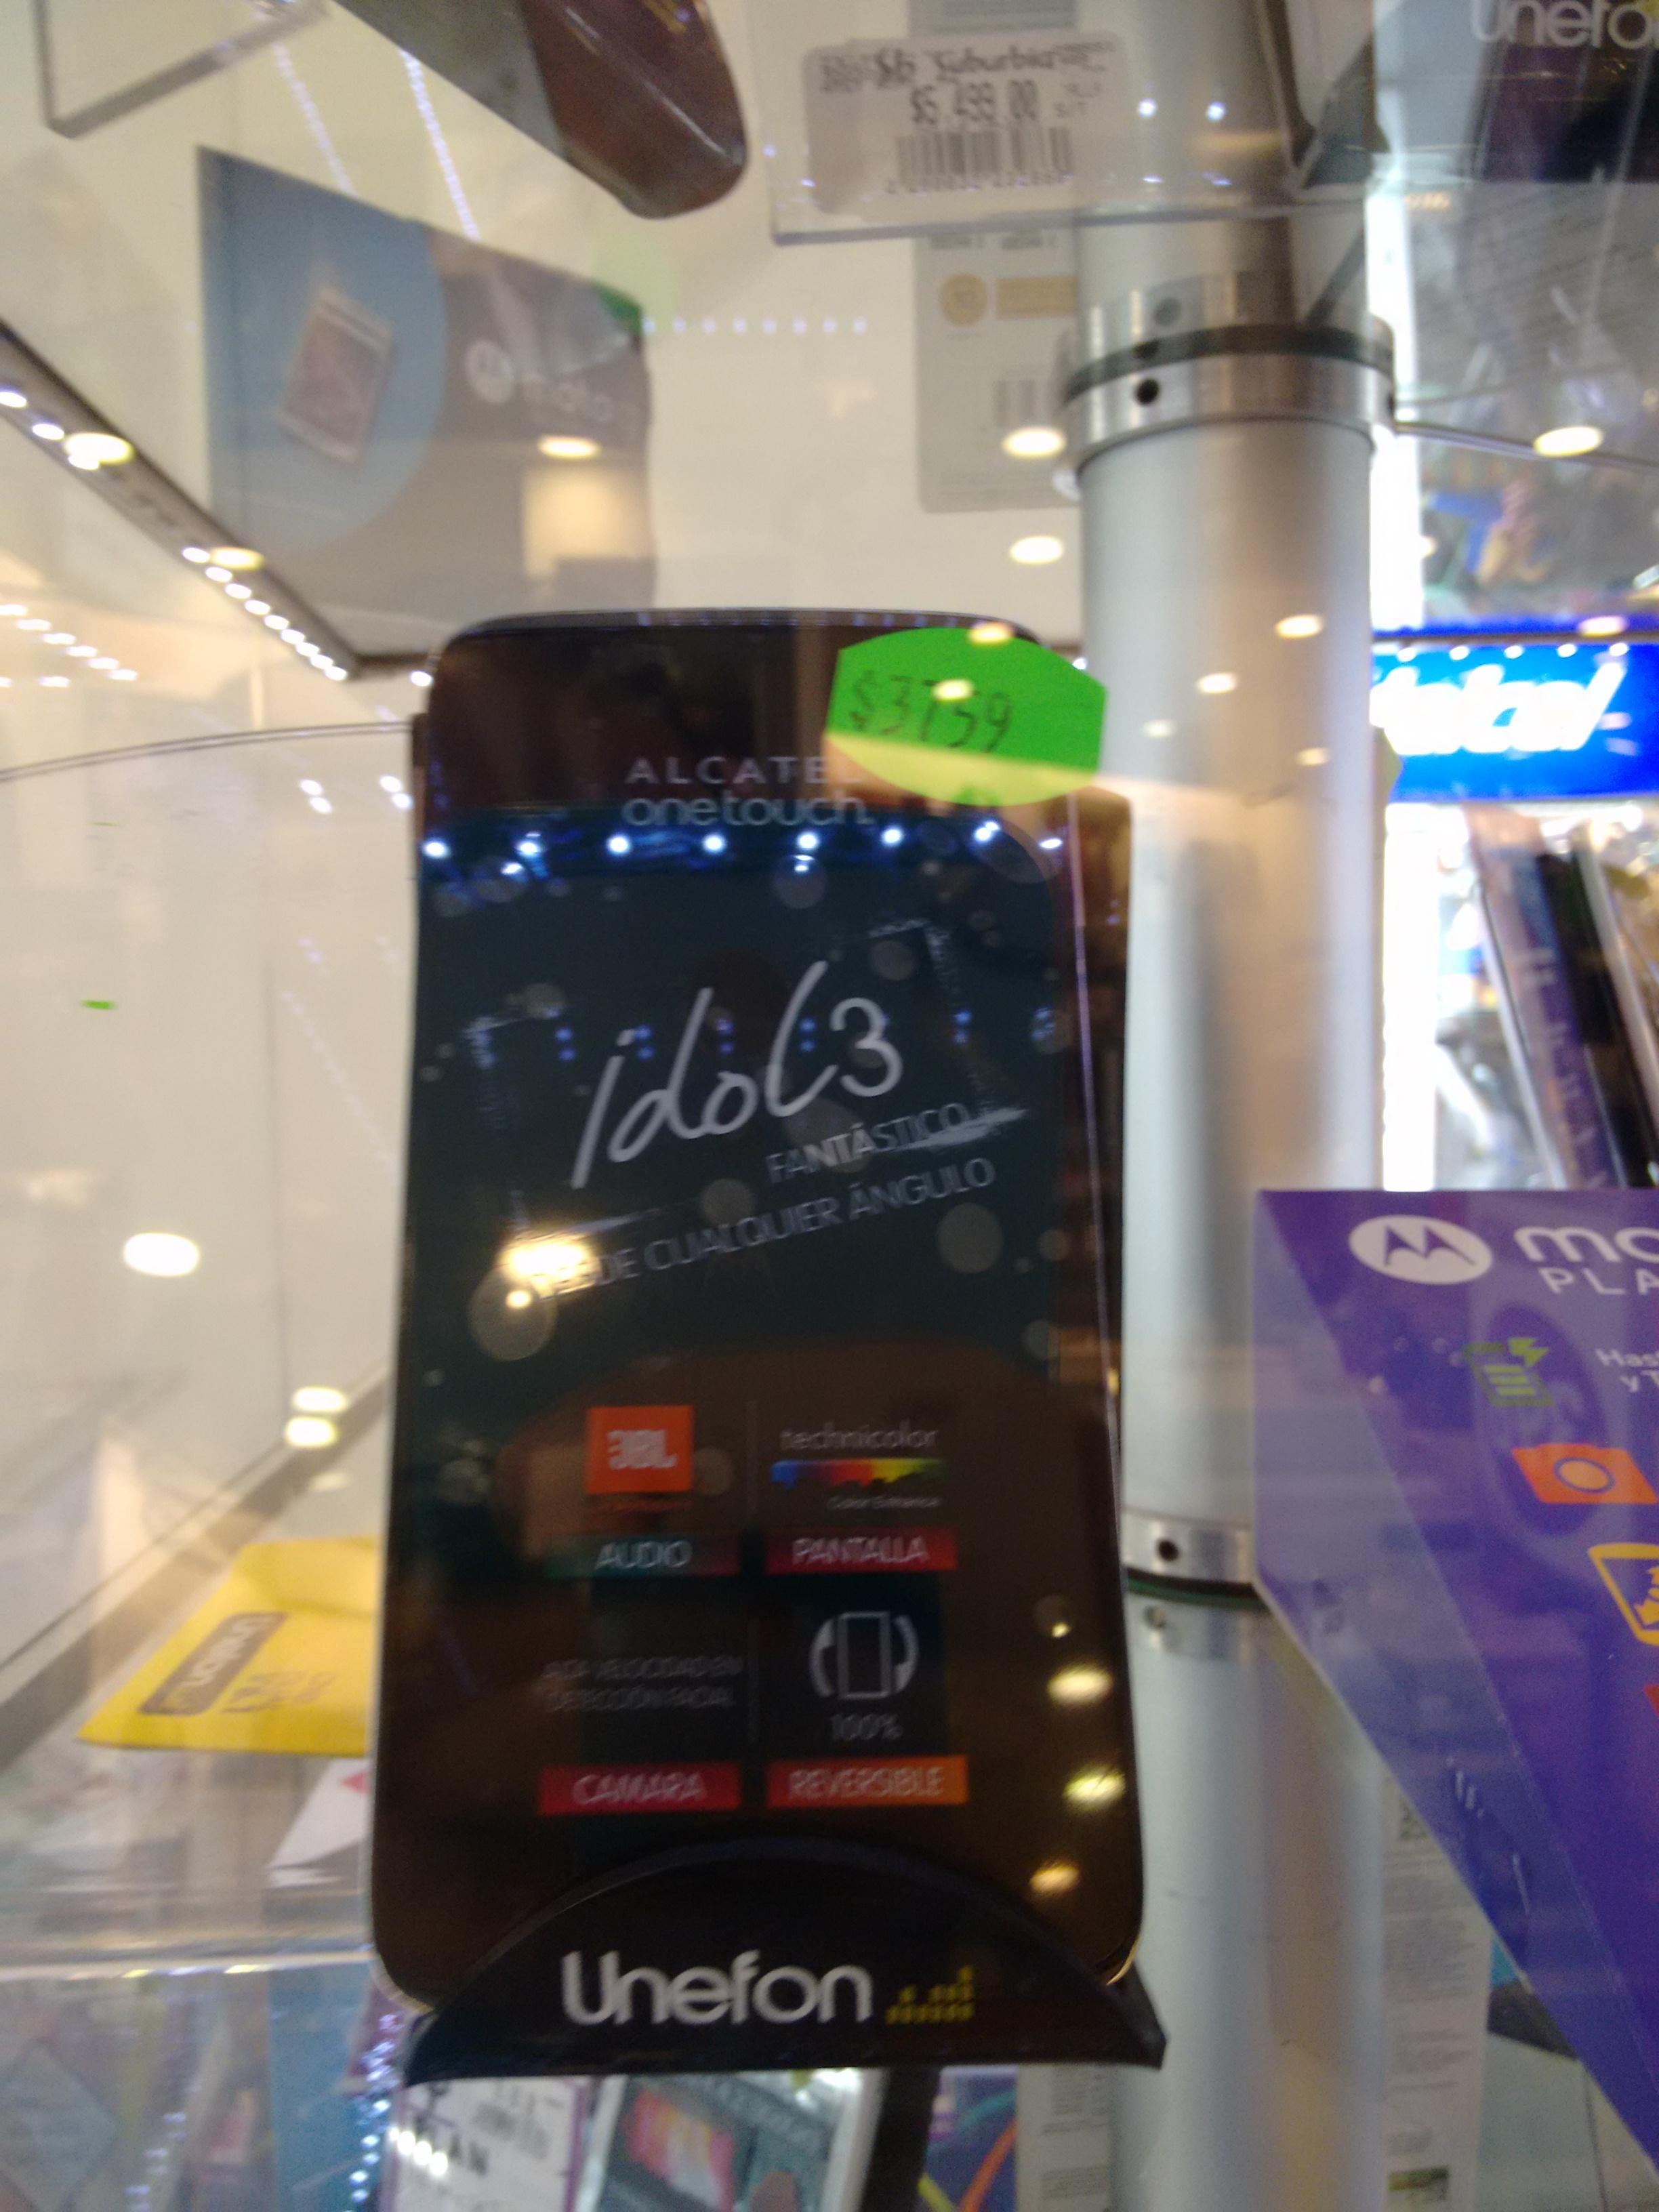 "Suburbia: Idol 3 de 5.5"" a $3,759"